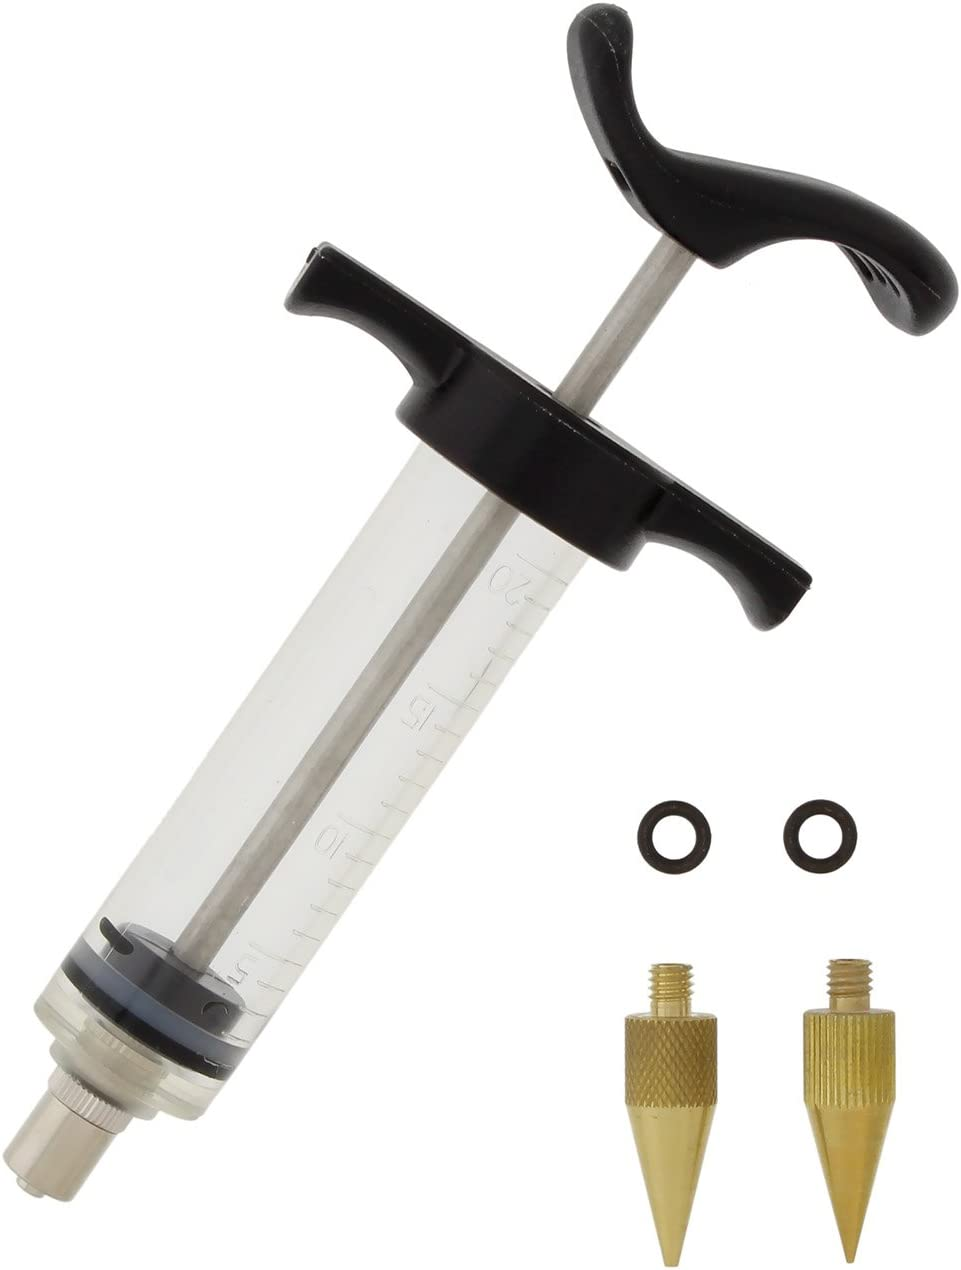 DCT Wood Glue Applicator Glue Syringe for Woodworking